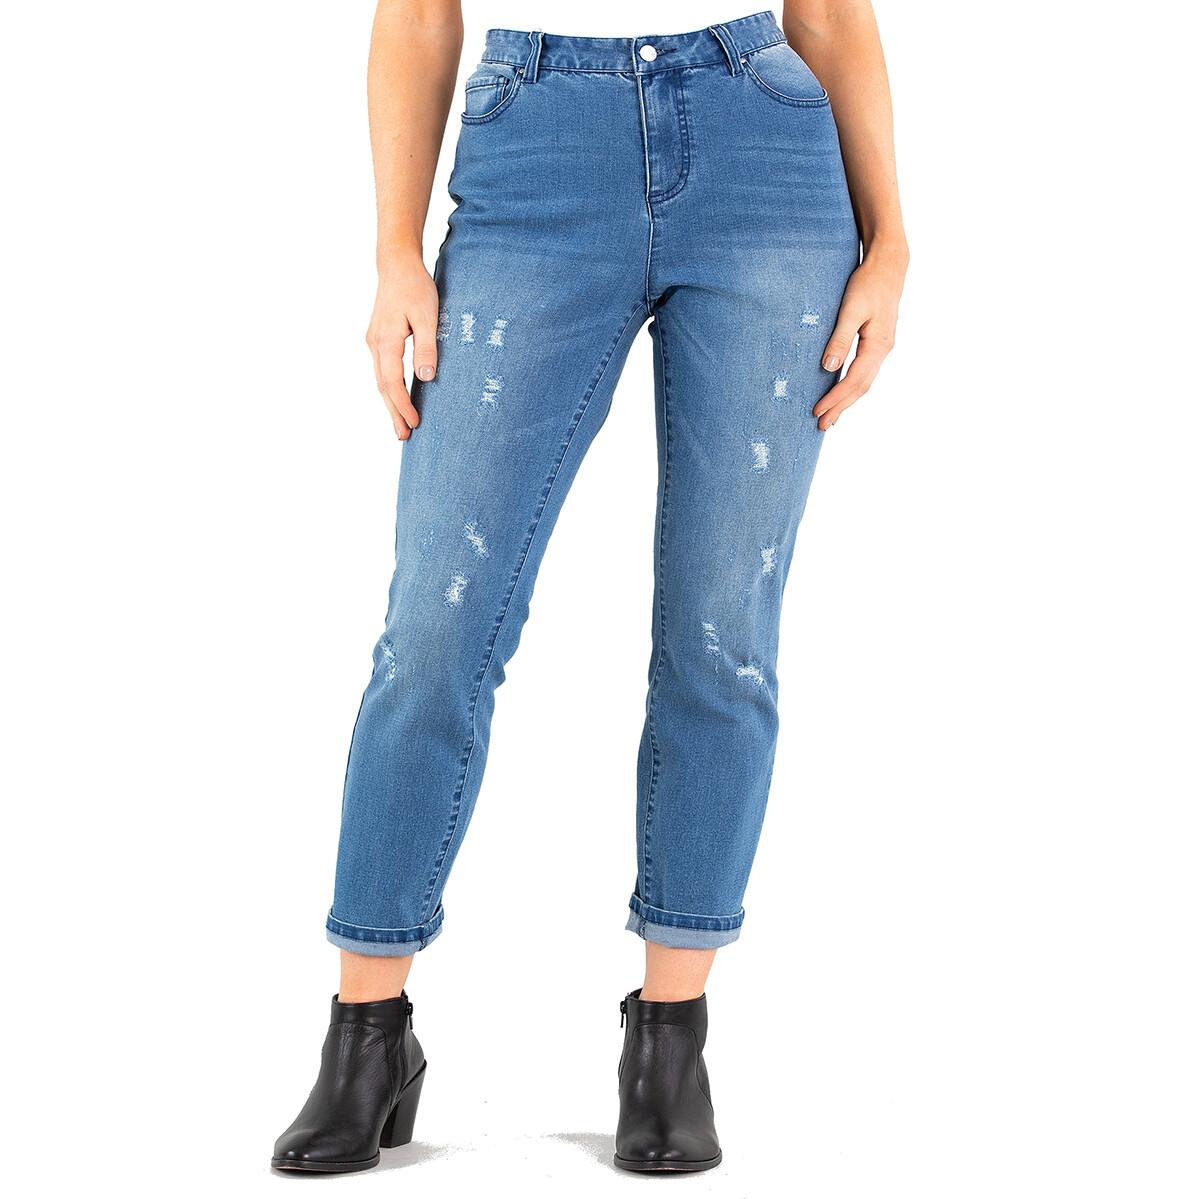 Cropped Length Stretch Denim Pants